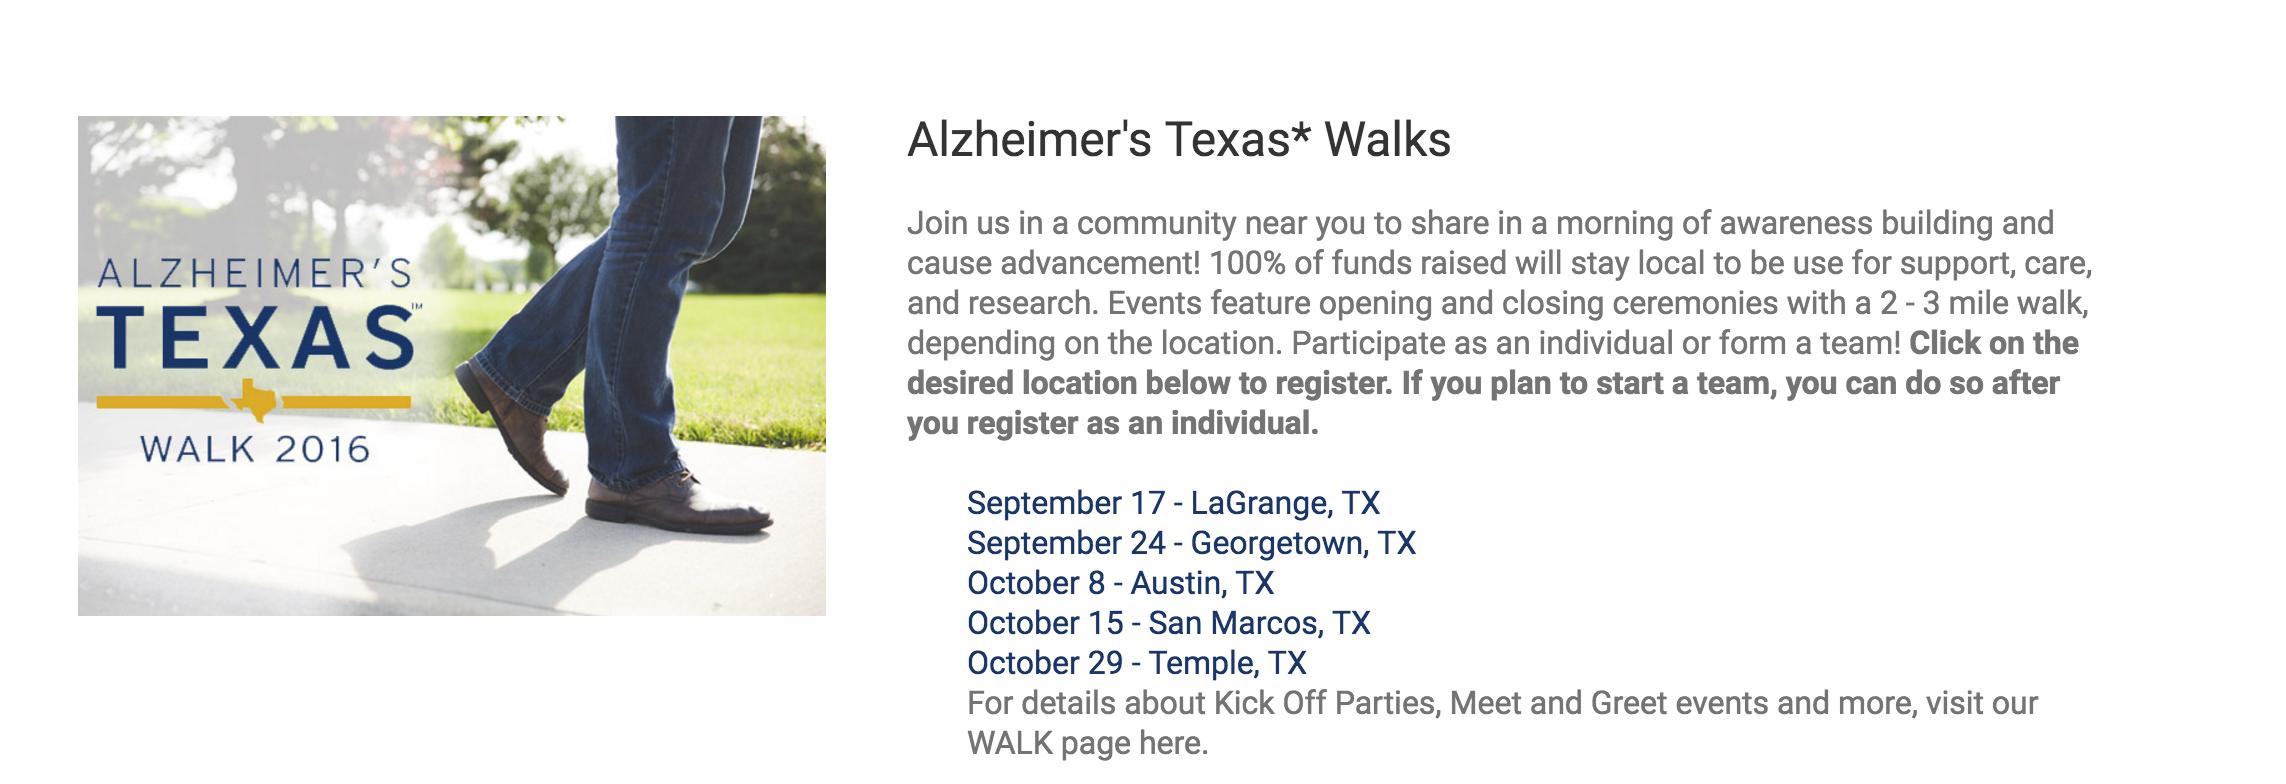 Learn more on their website-  Alzheimer's Texas